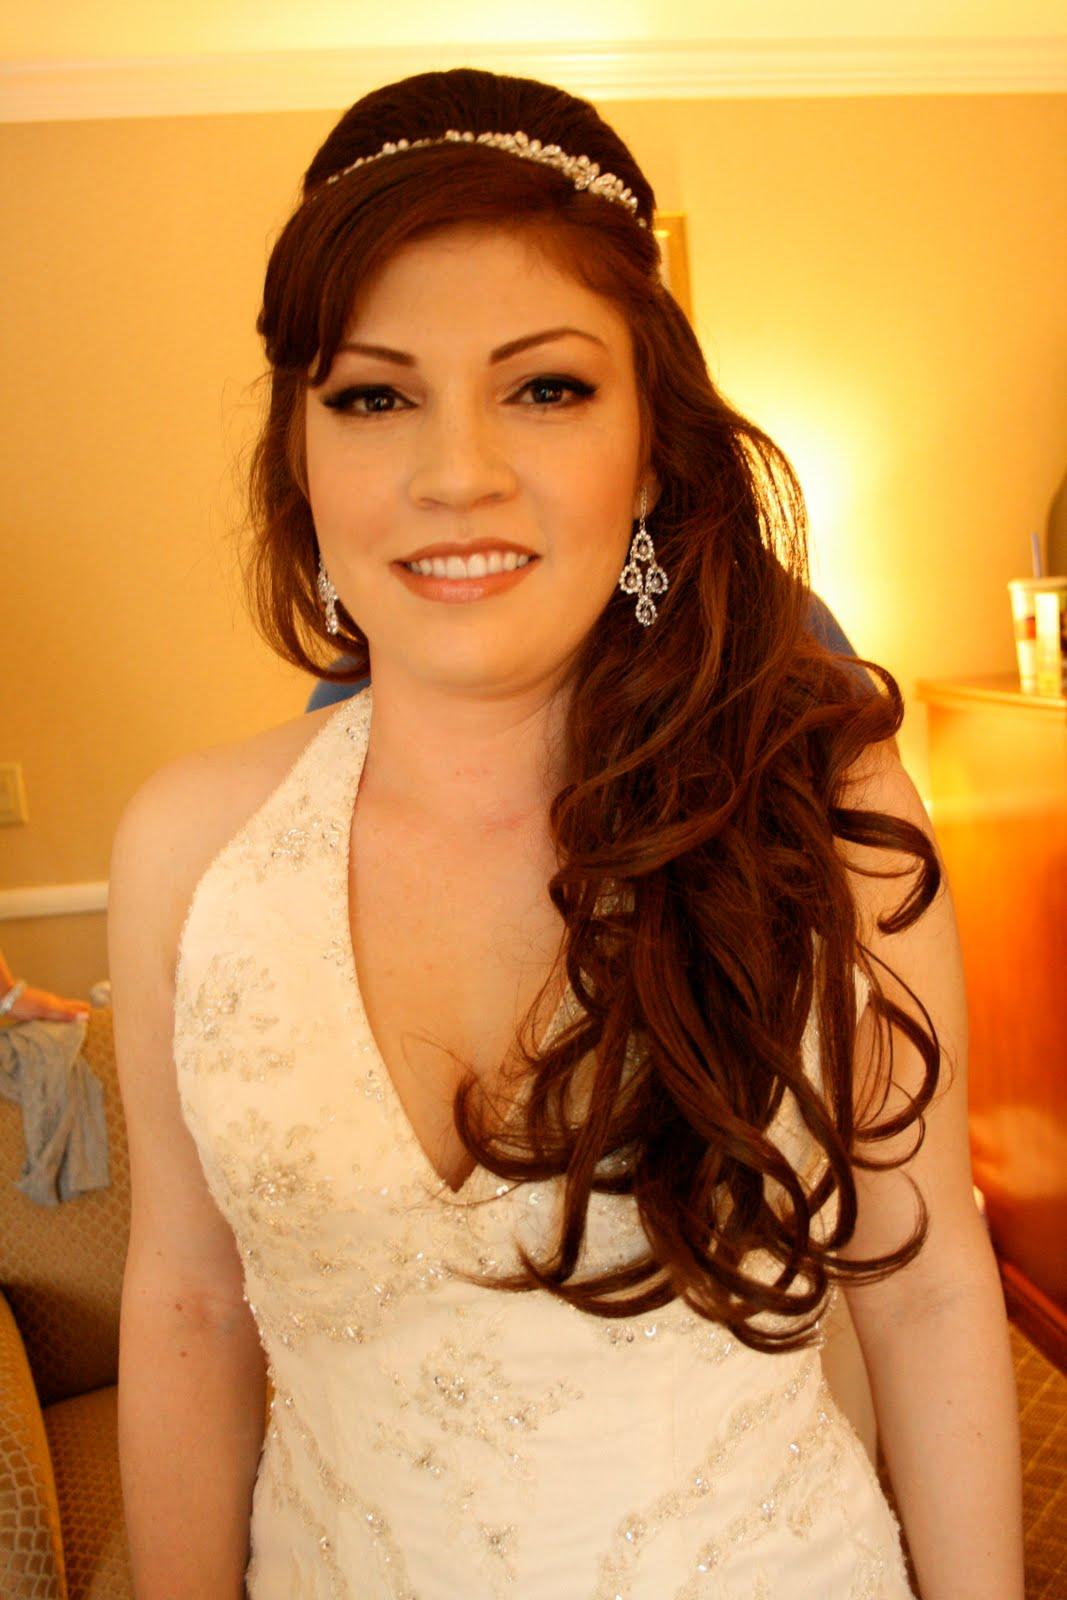 dana point , california beach wedding hair and makeup before